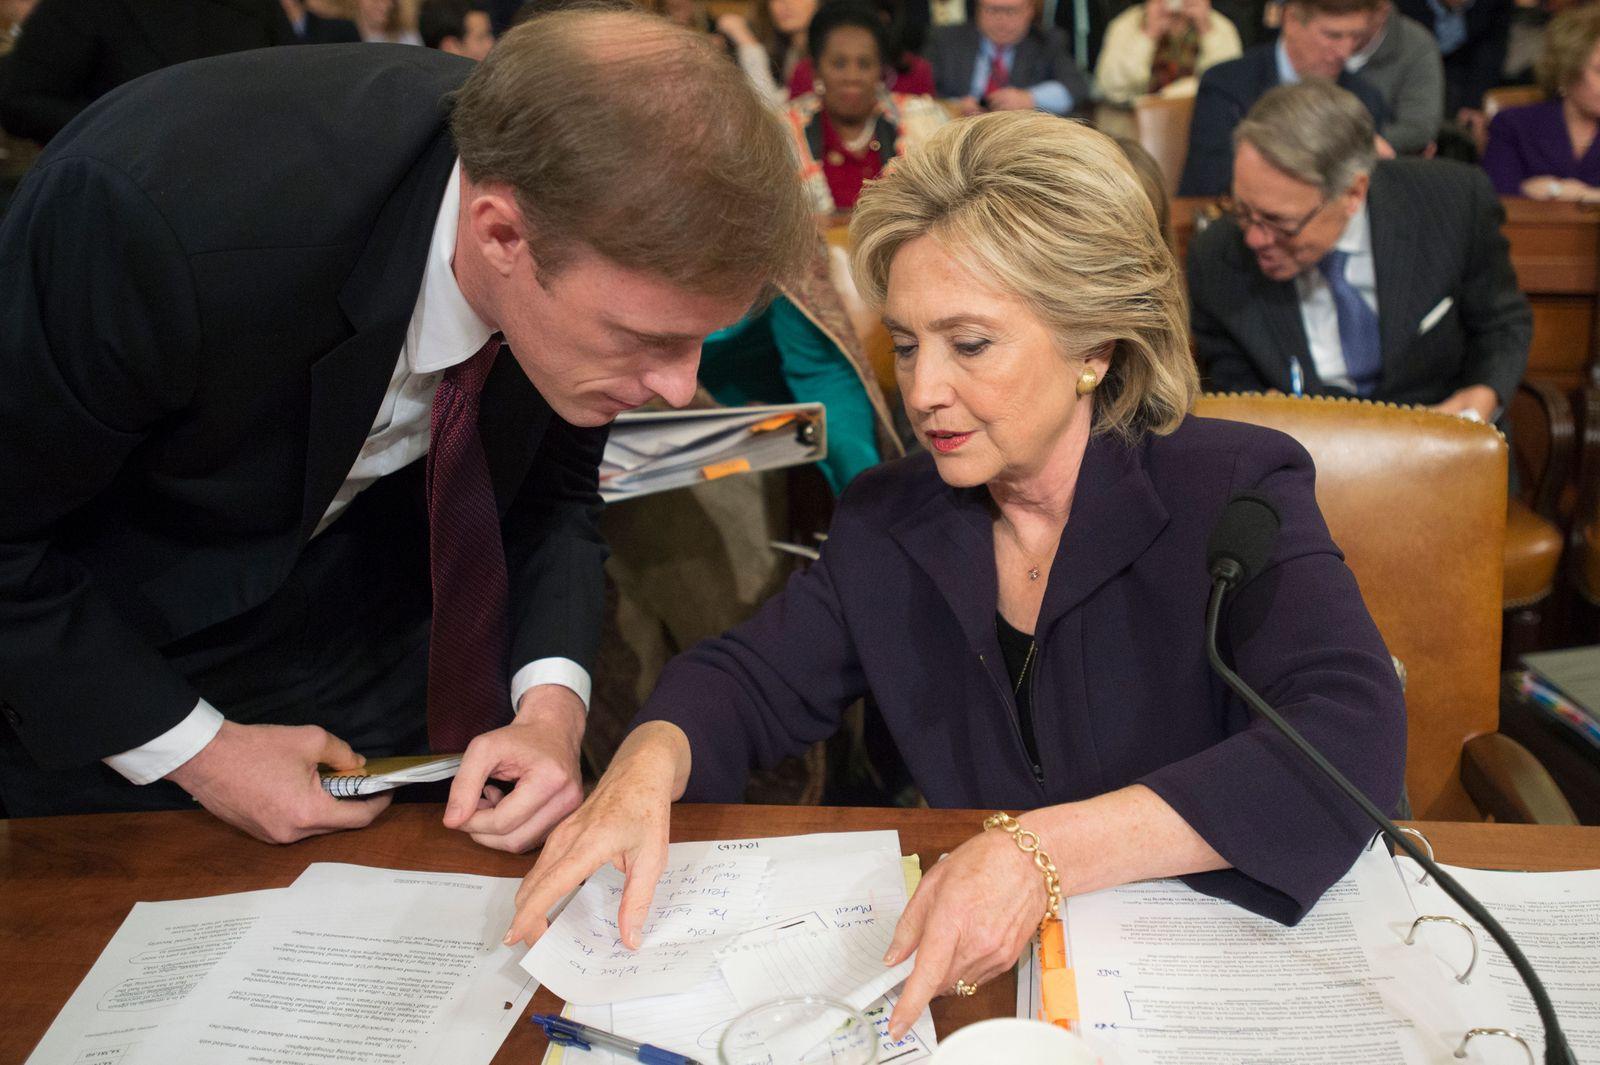 US President-elect selects Jake Sullivan as National Security Advisor, Washington, Usa - 22 Oct 2015